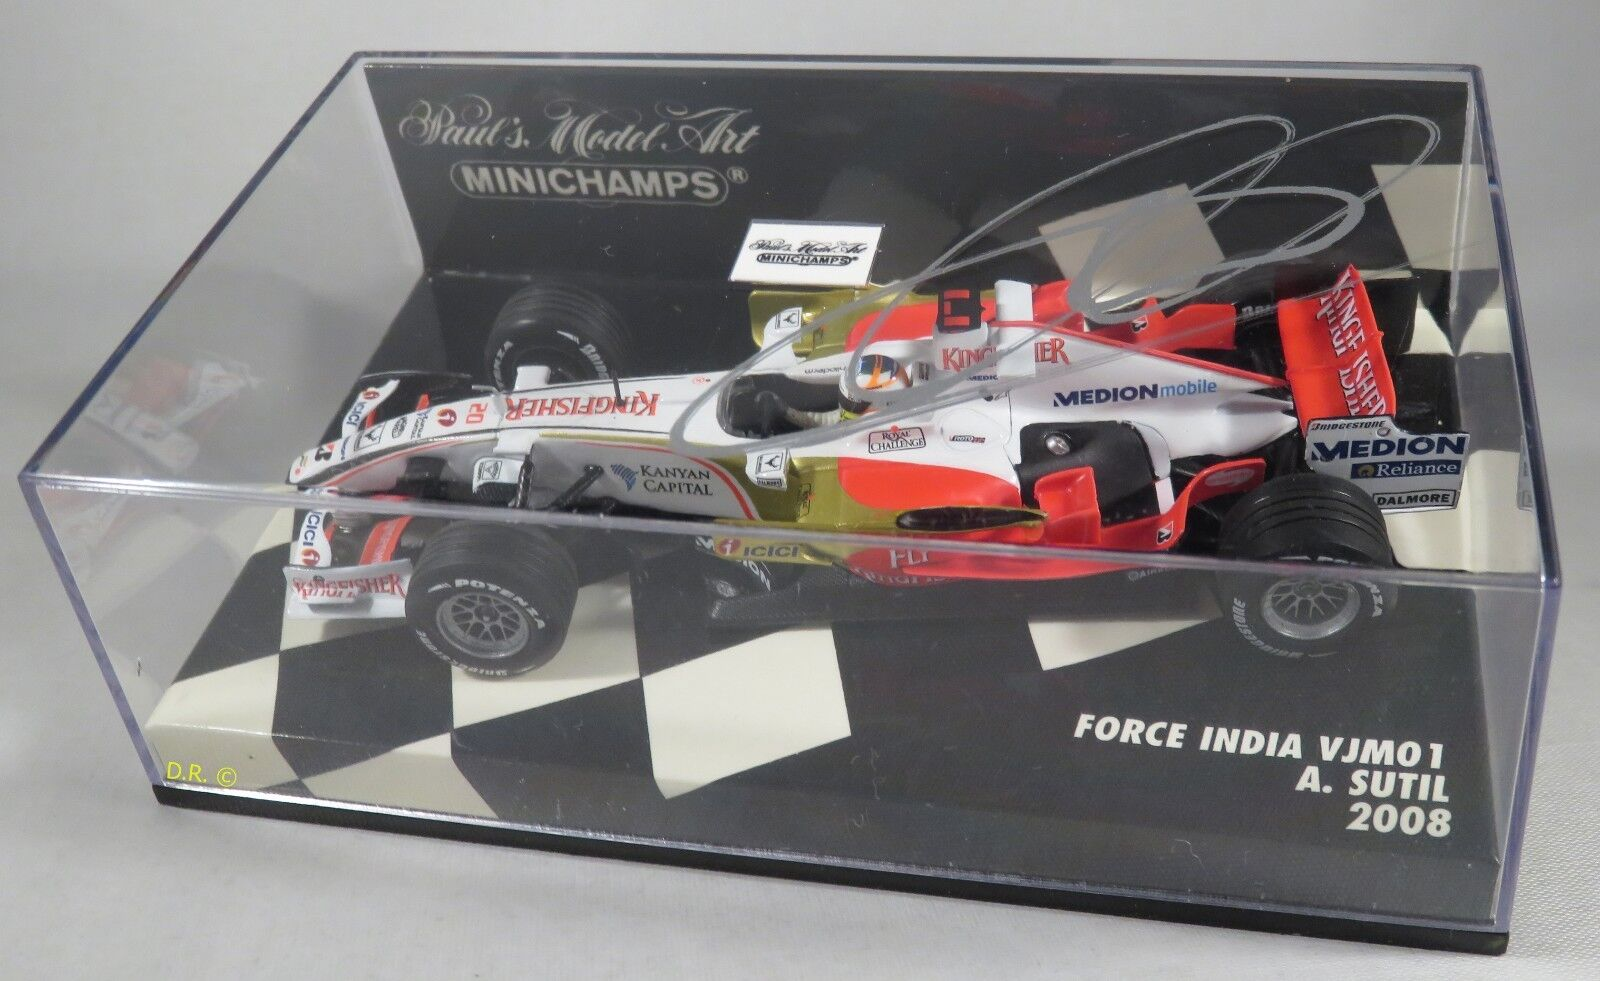 FORCE INDIA FERRARI VJM01 Adrian Sutil F1 F1 F1 2008 signed box MINICHAMPS 1 43 9932e2